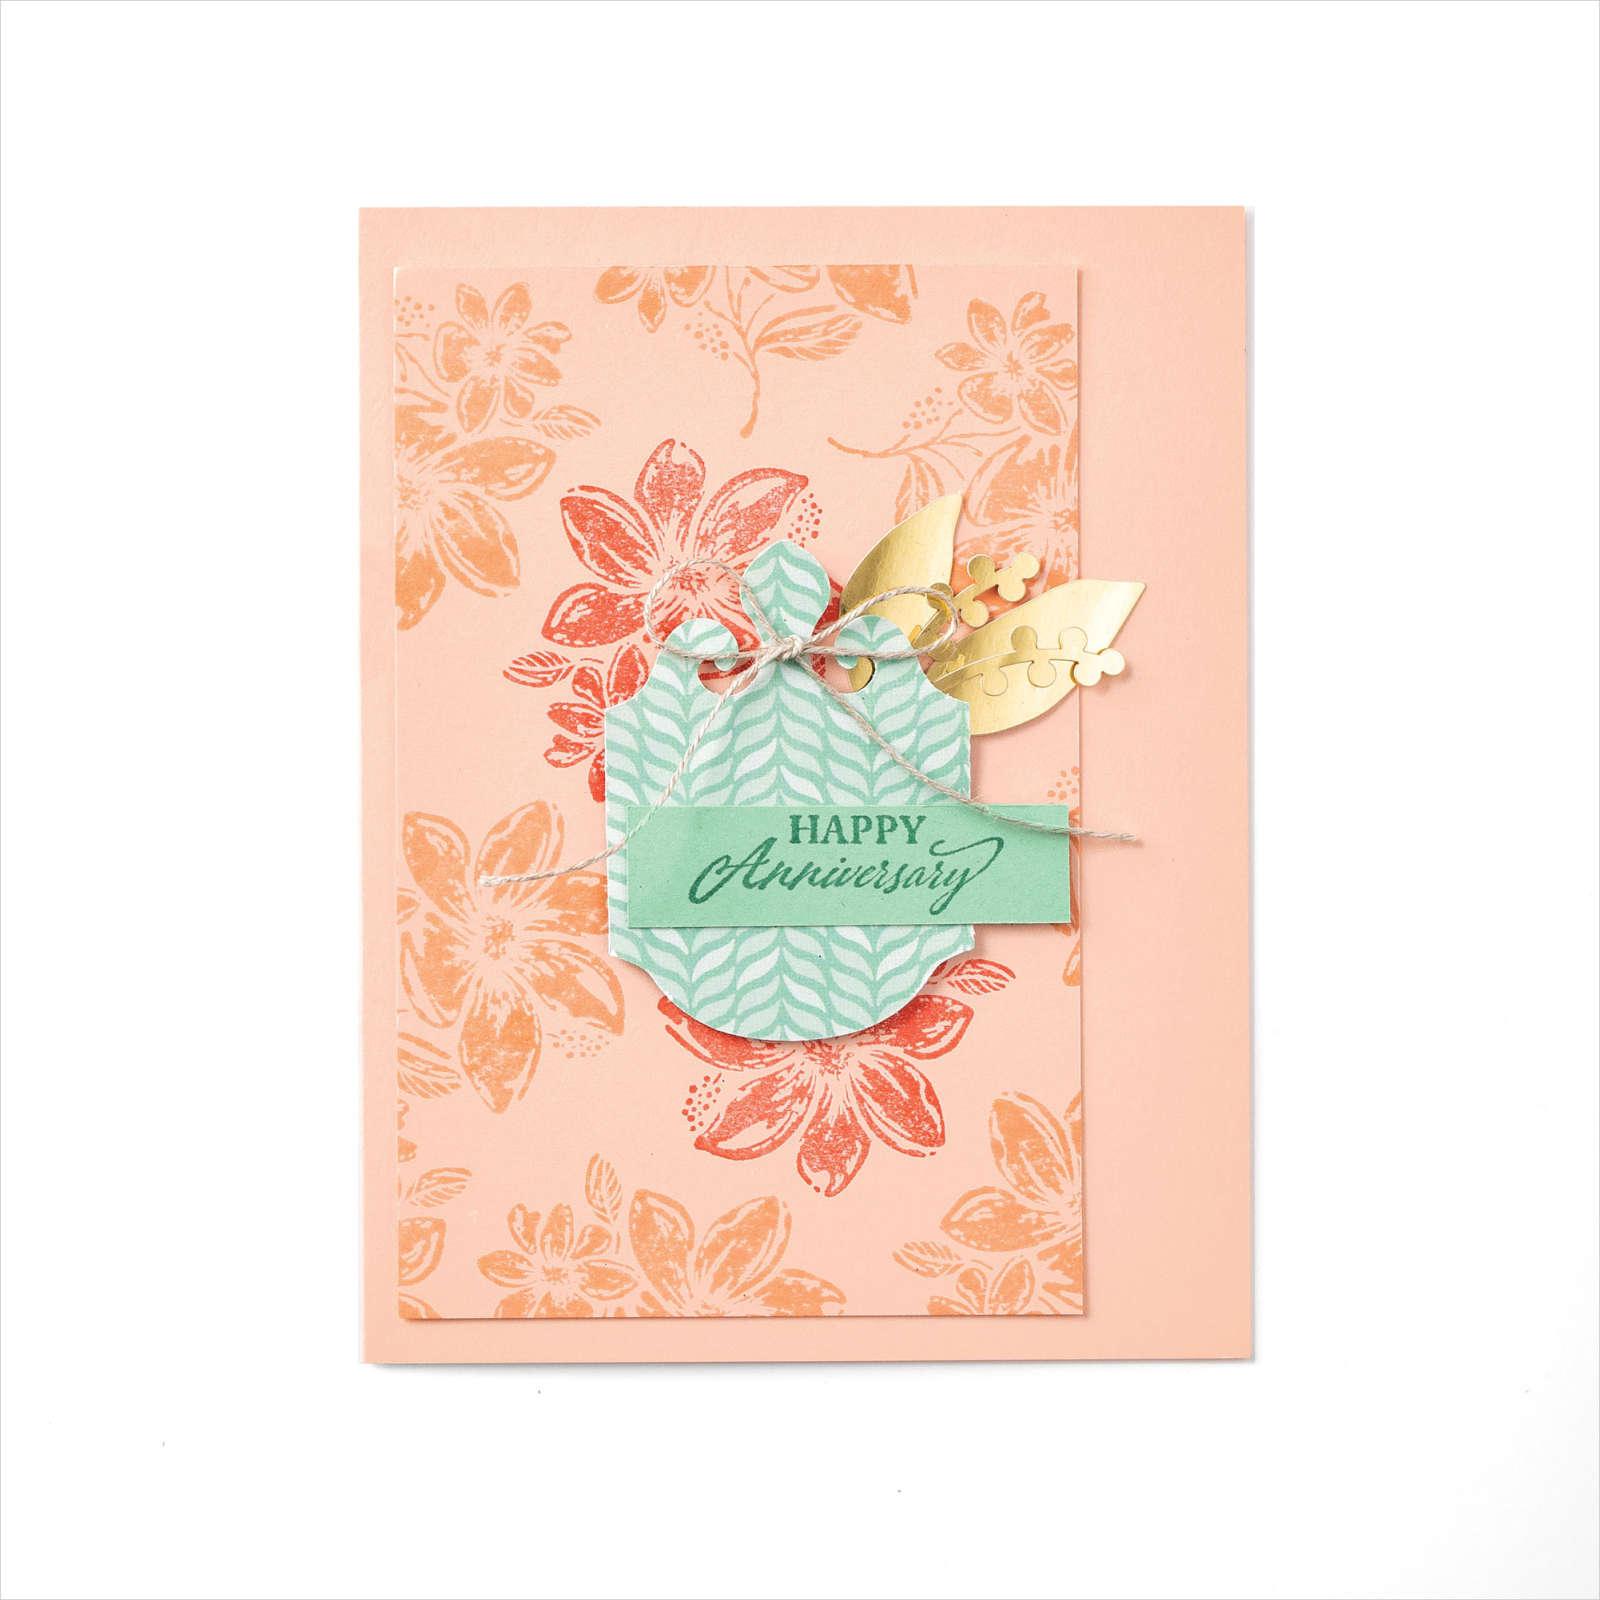 Annual Catalog - Simply Elegant Card